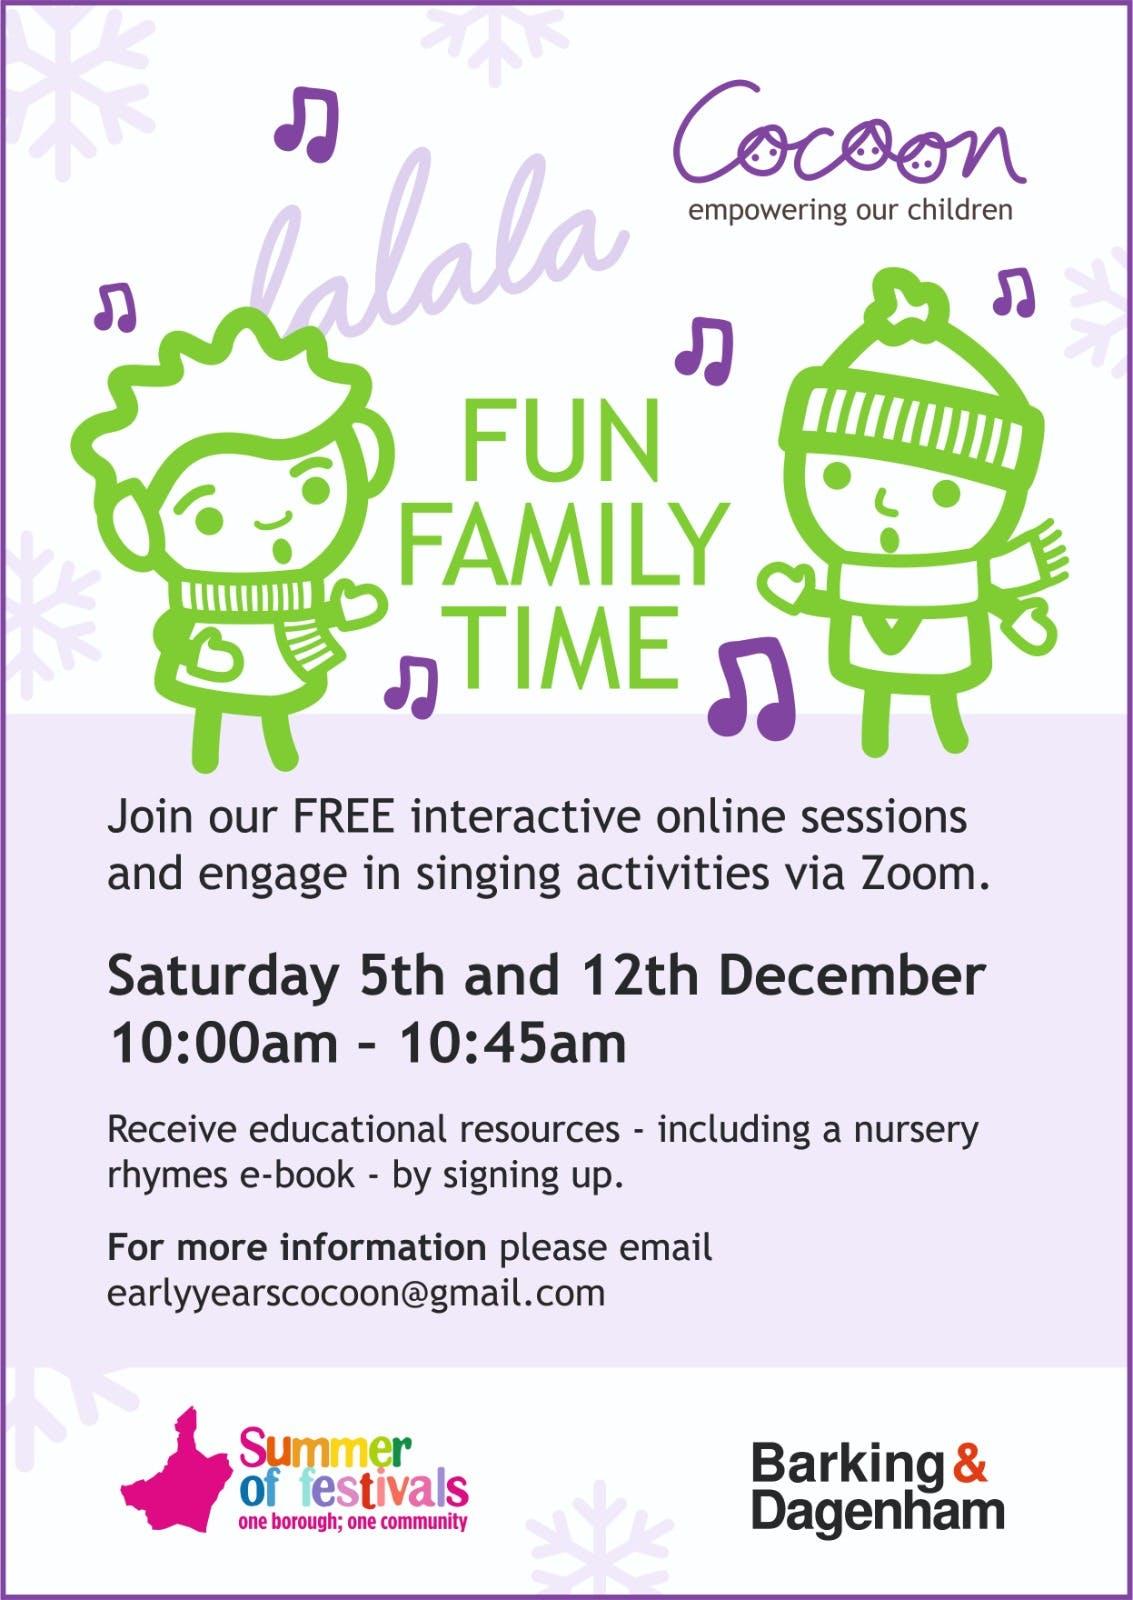 Lalala 3 & 4 Christmas/Winter event